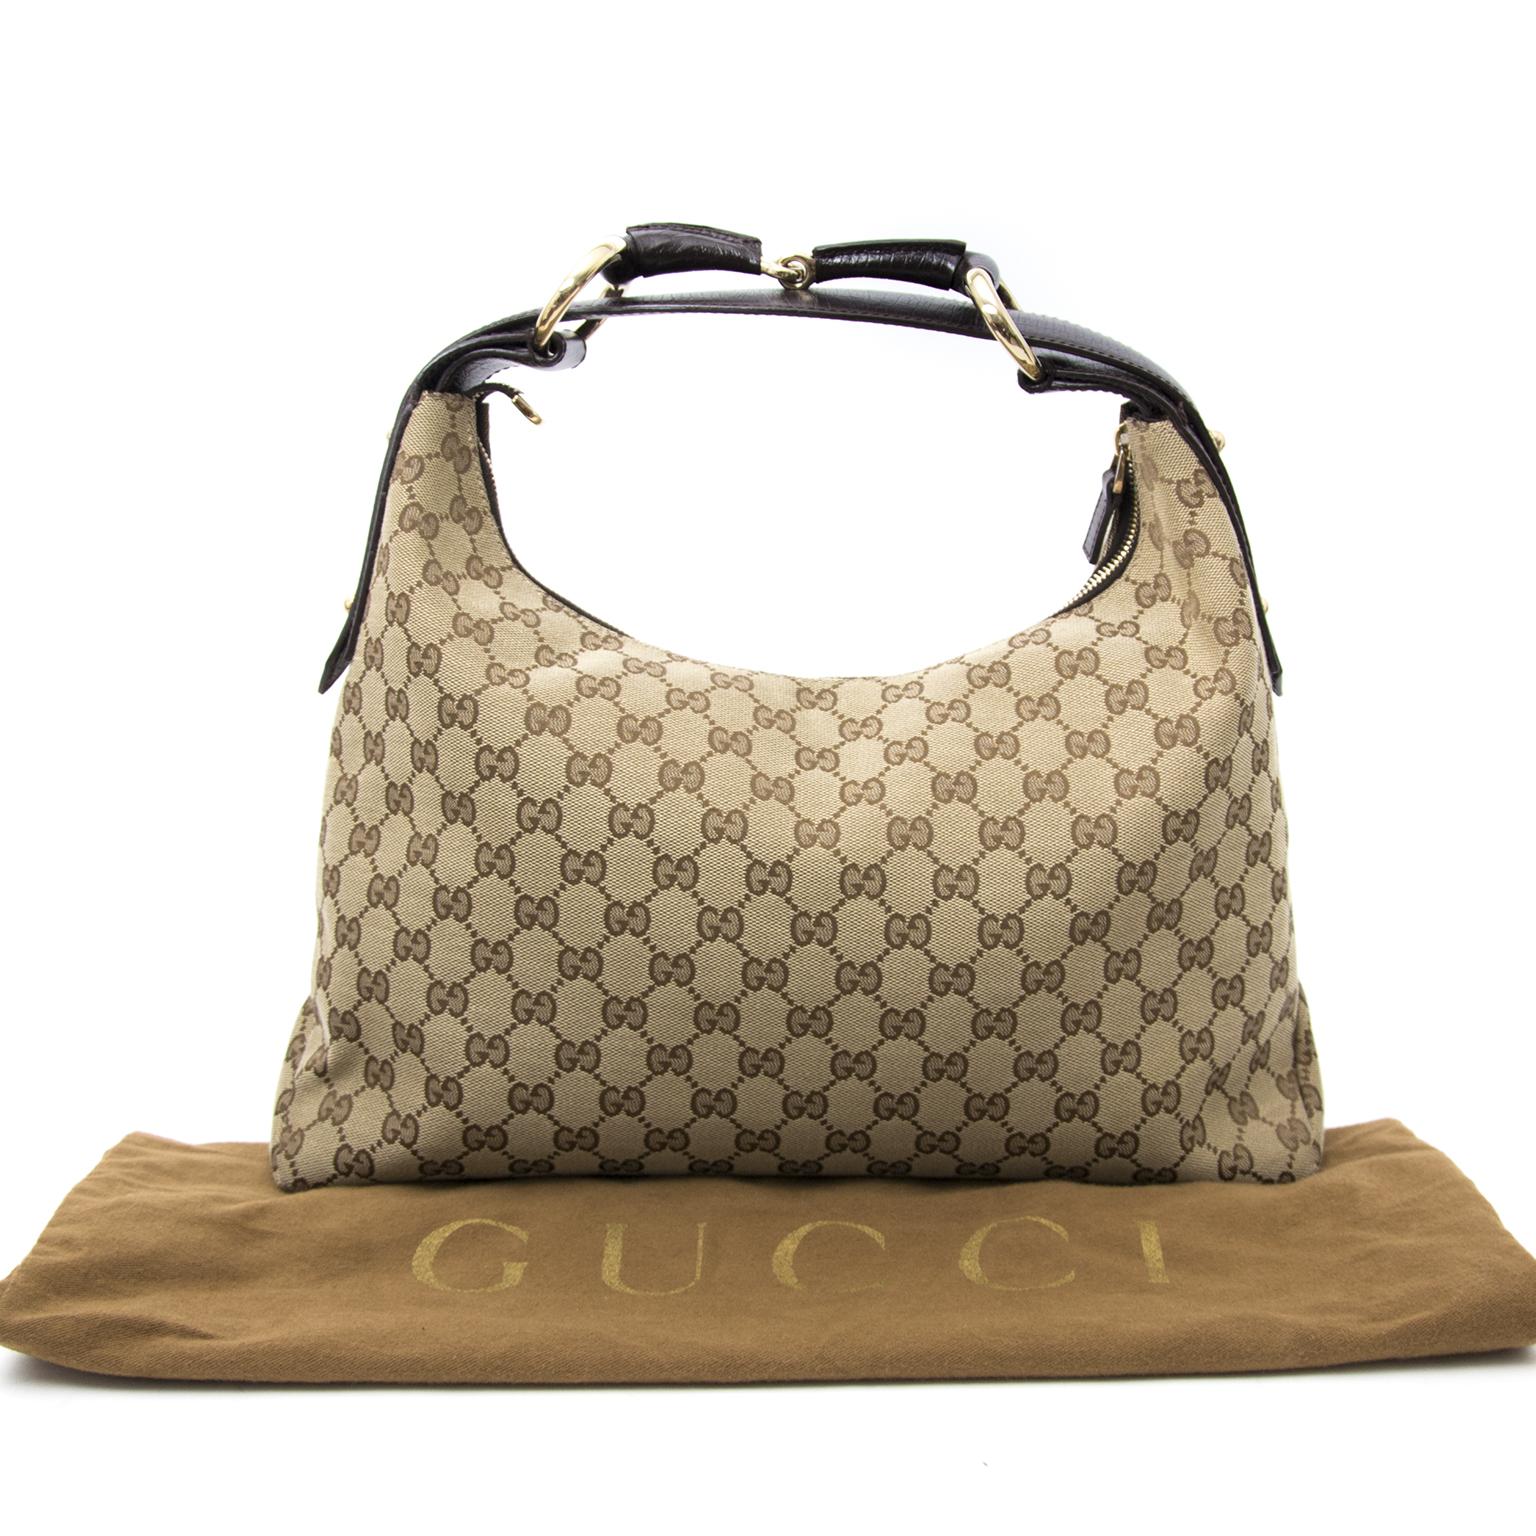 comme neuf sac a main Gucci Monogram Hobo Bag Anvers et en ligne